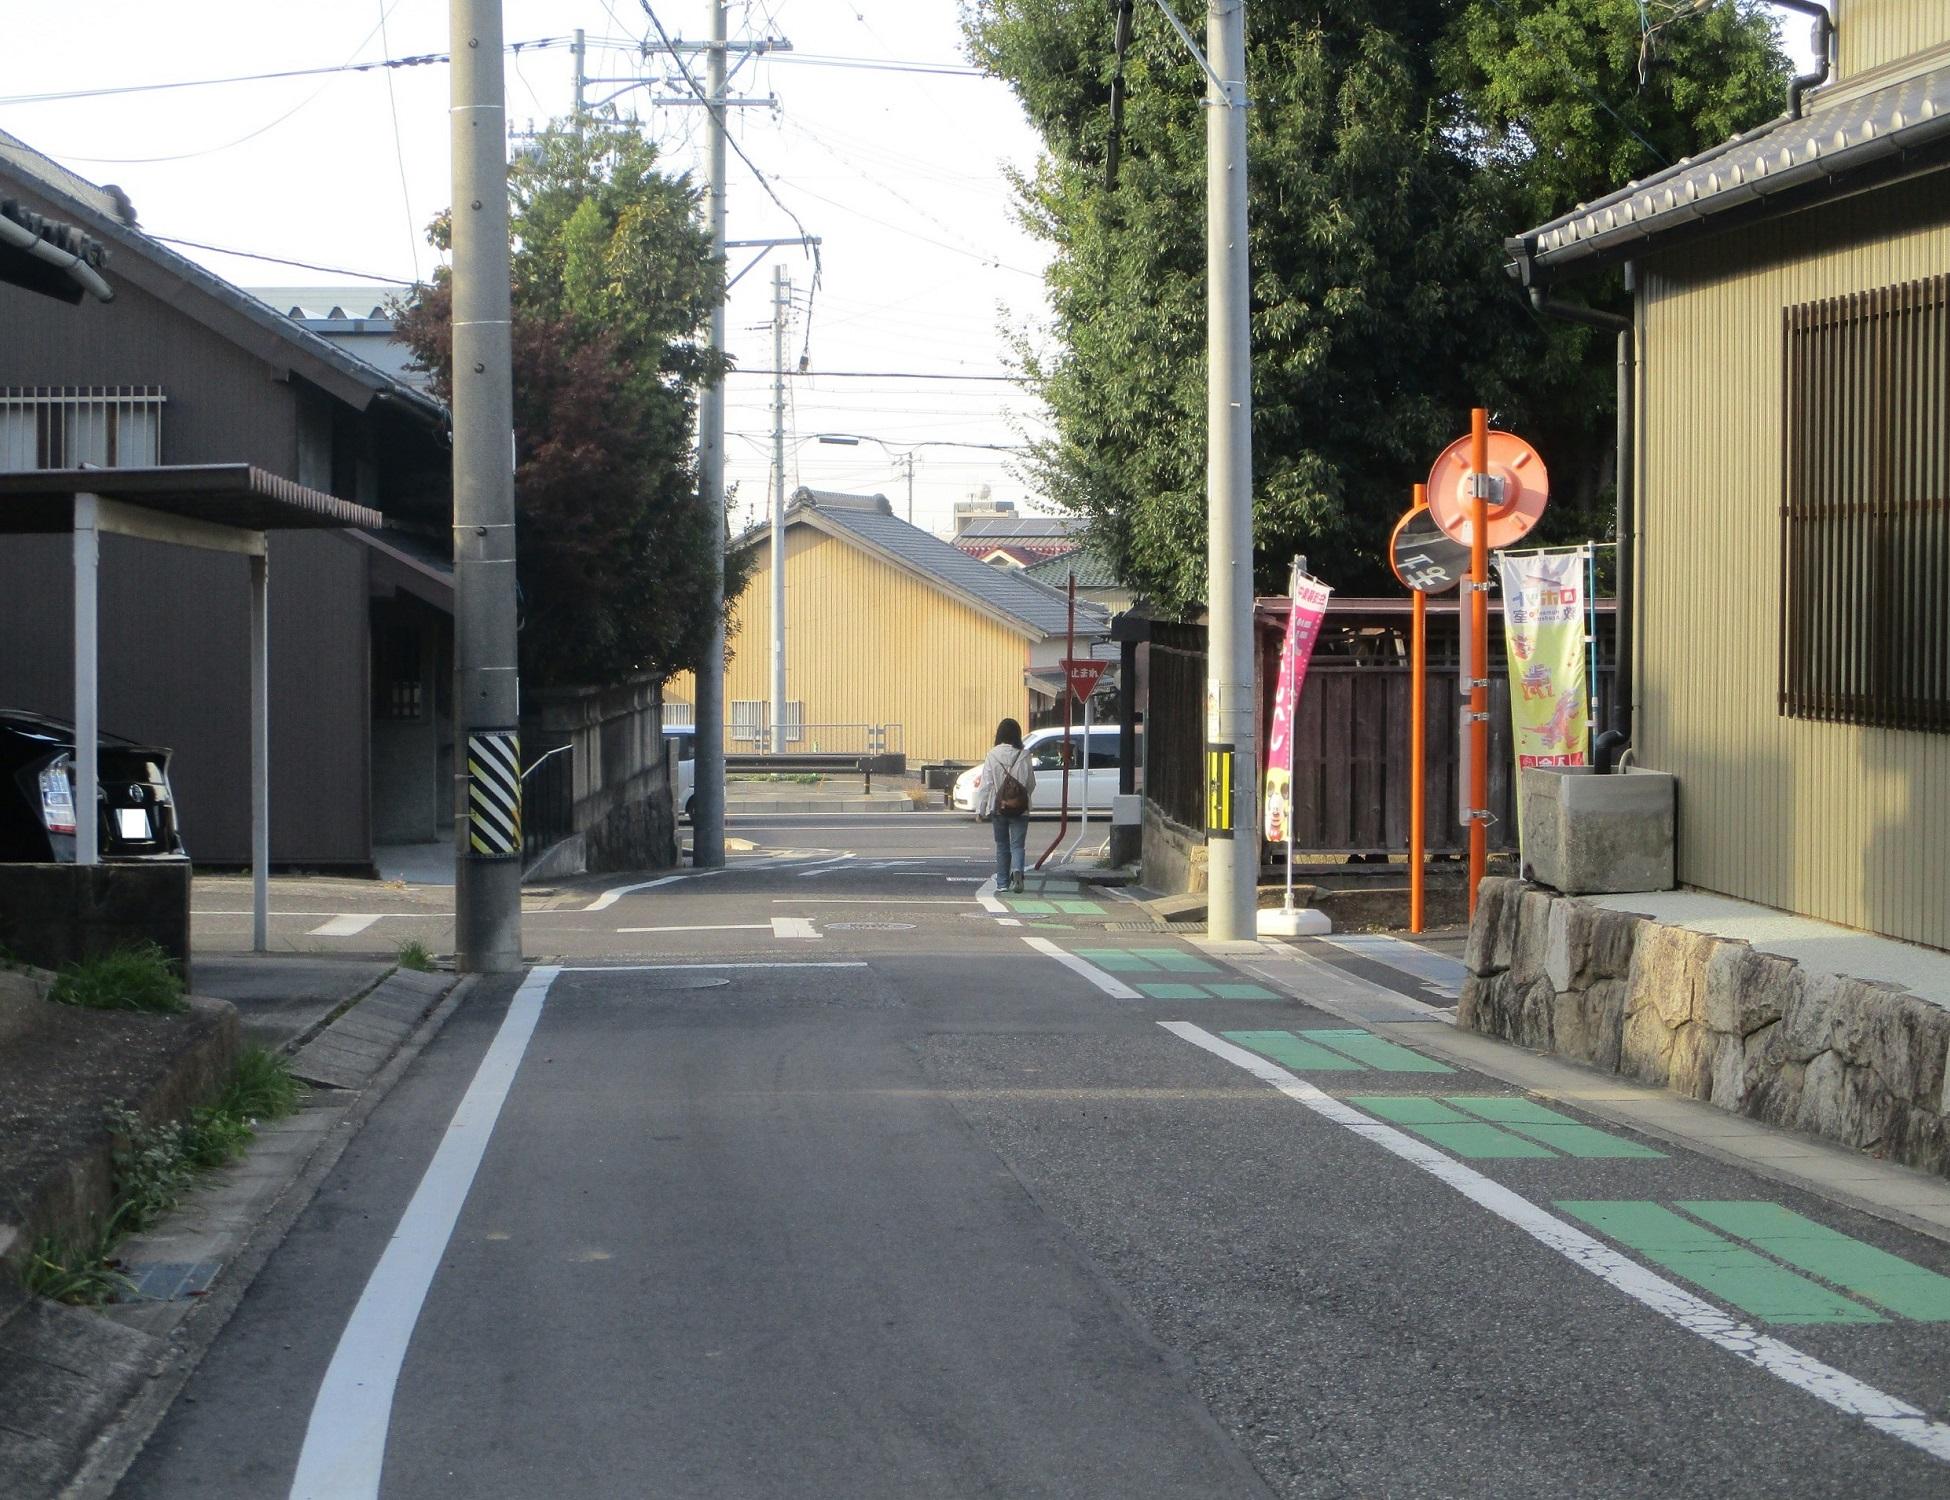 2019.11.13 (55) 東海道 - 国道155号線え 1950-1500